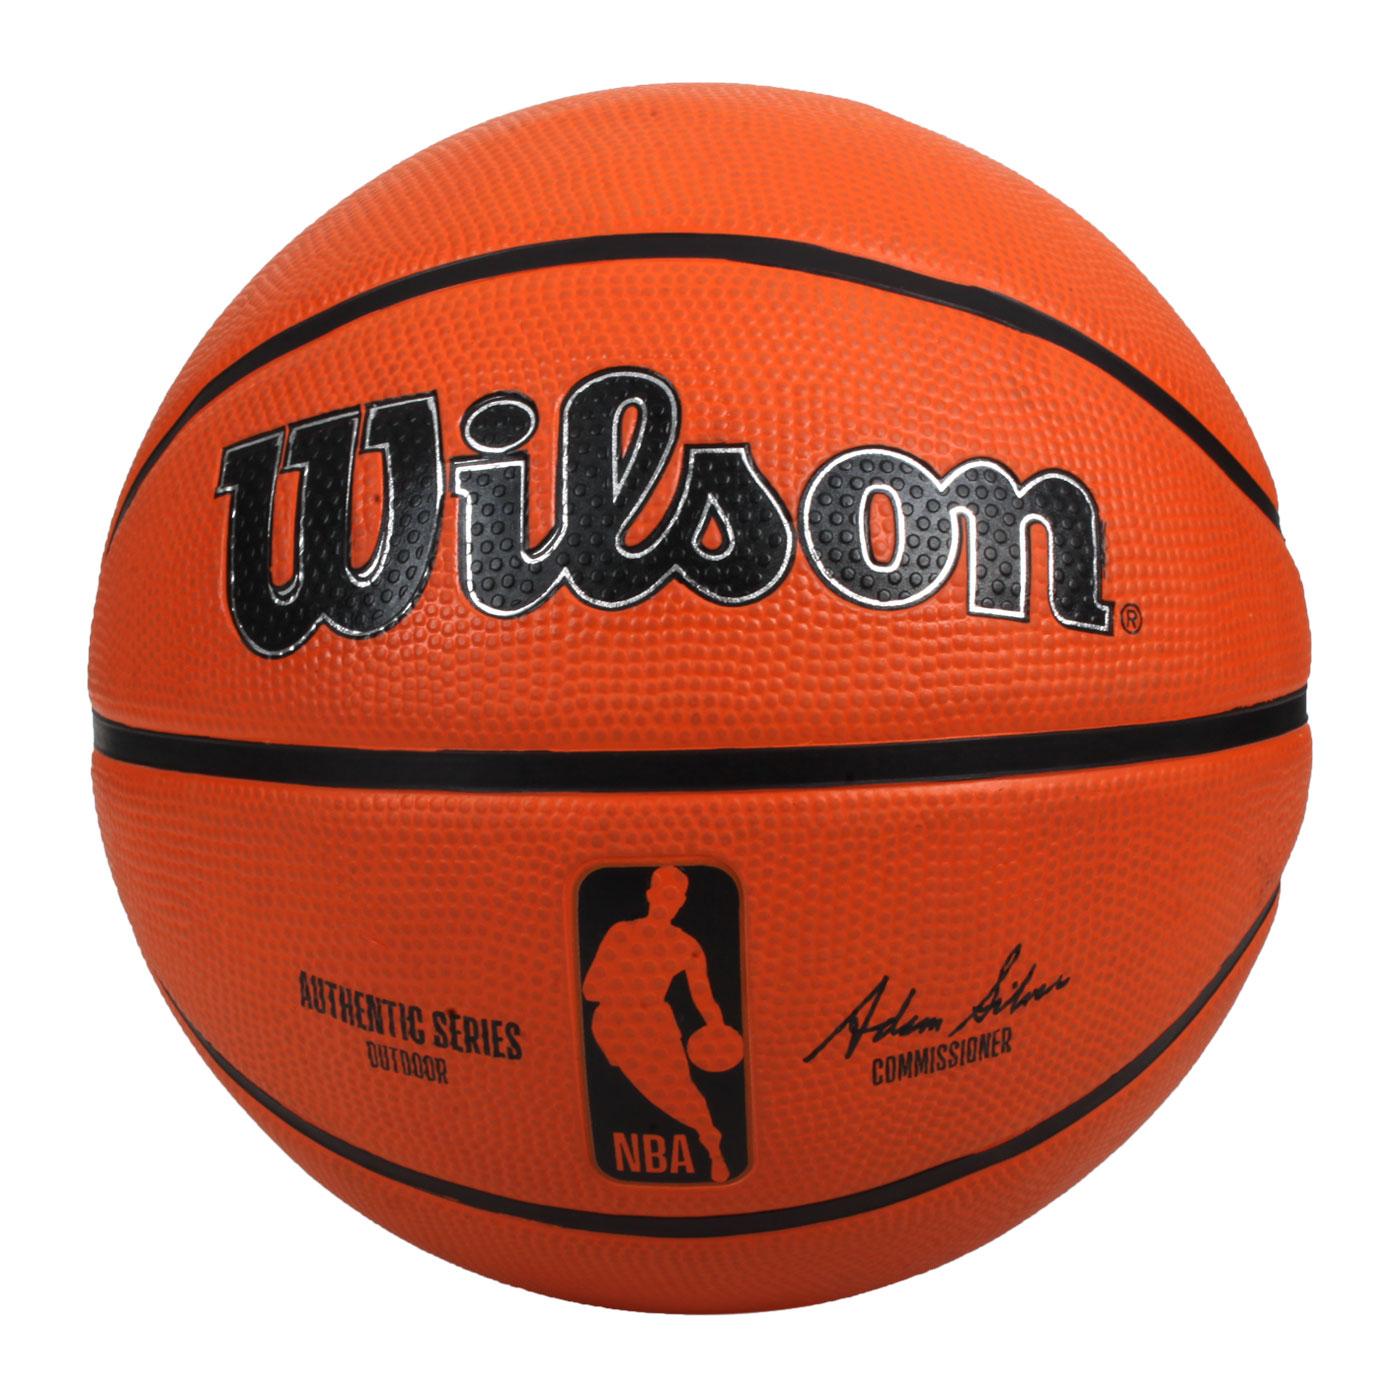 WILSON NBA AUTH系列室外橡膠籃球#7 WTB7300XB07 - 橘黑